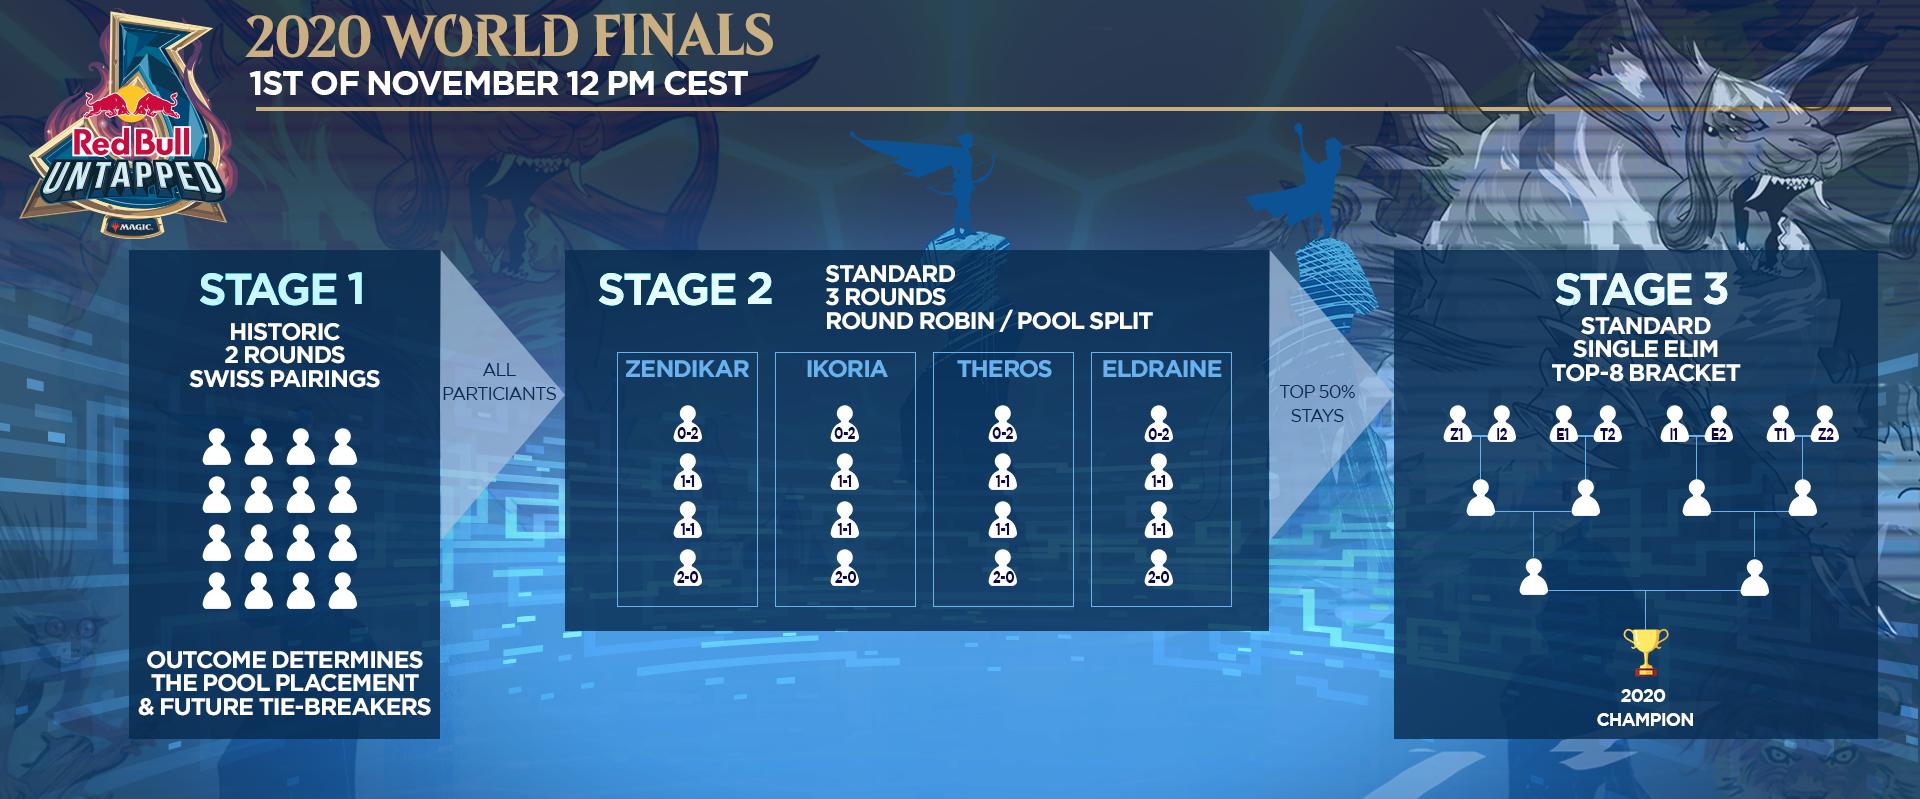 Red Bull Finals format